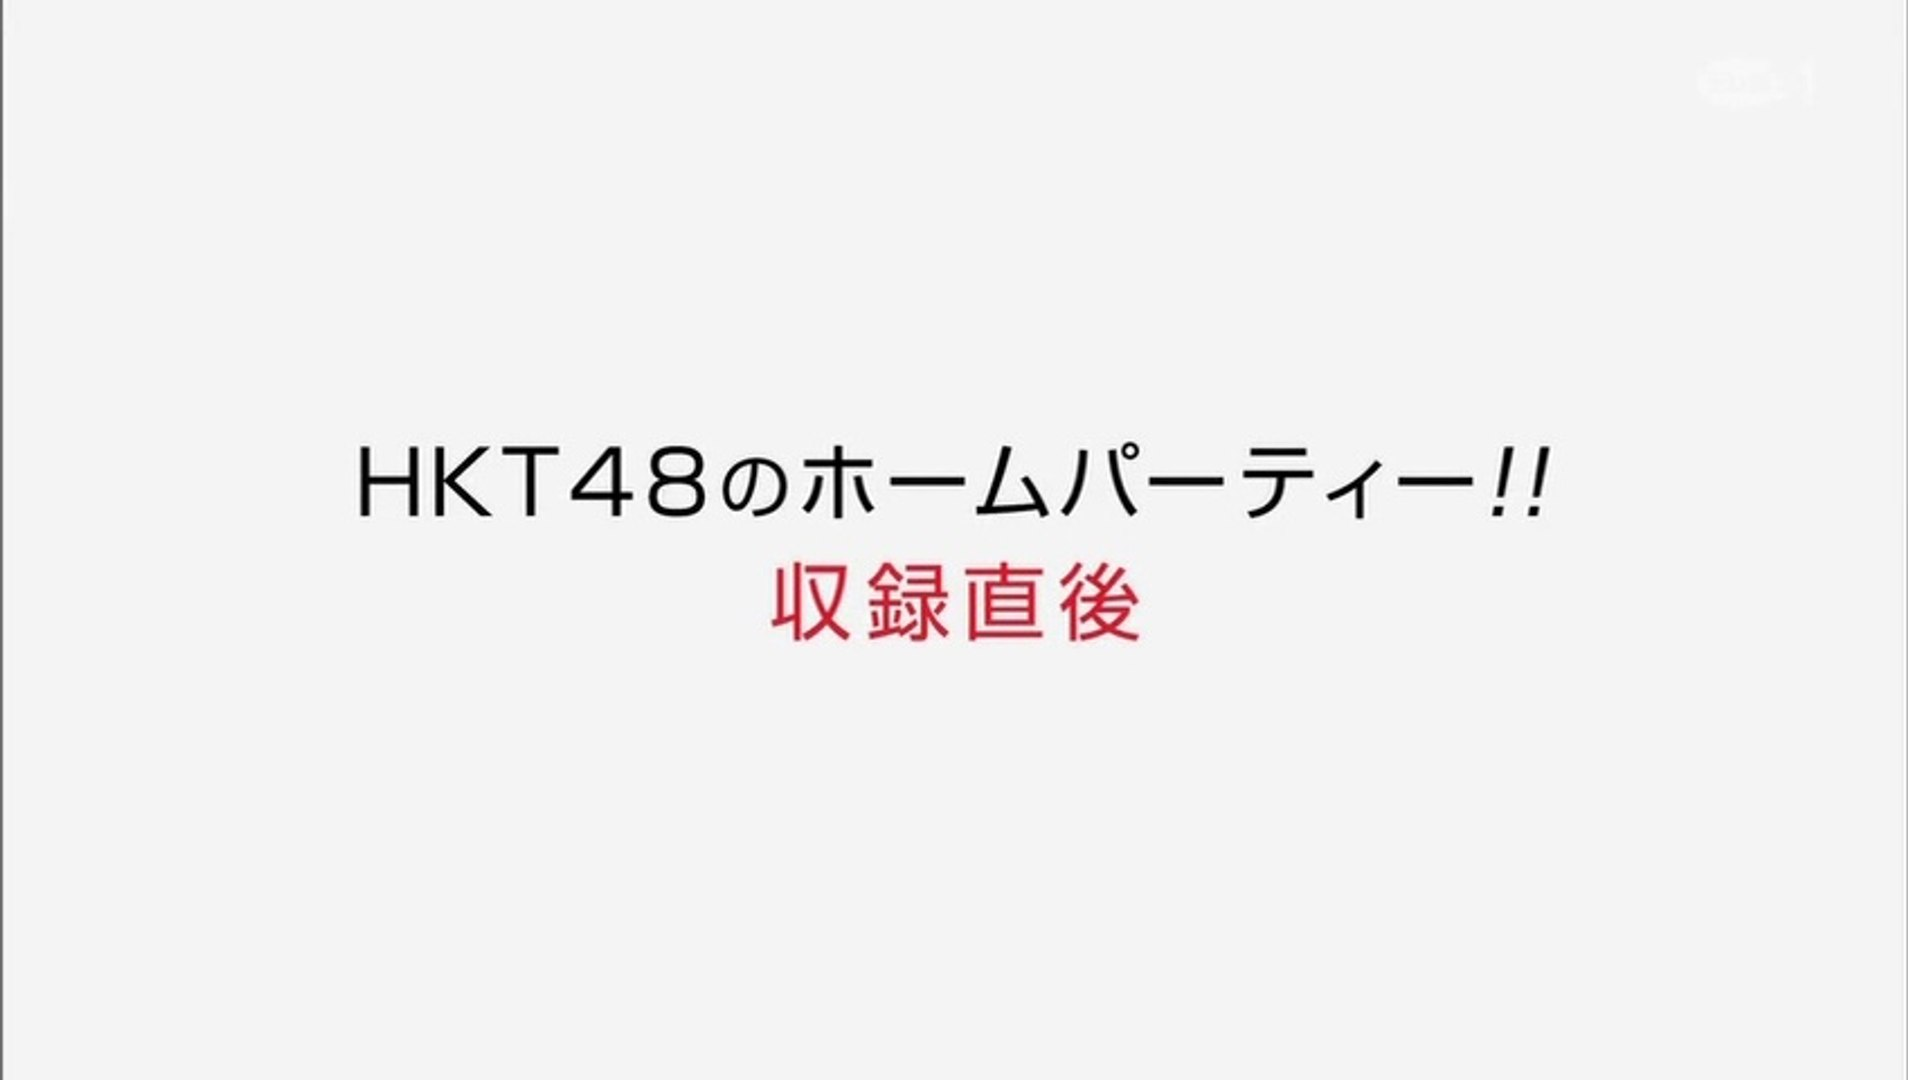 HKT48 no home party part 1